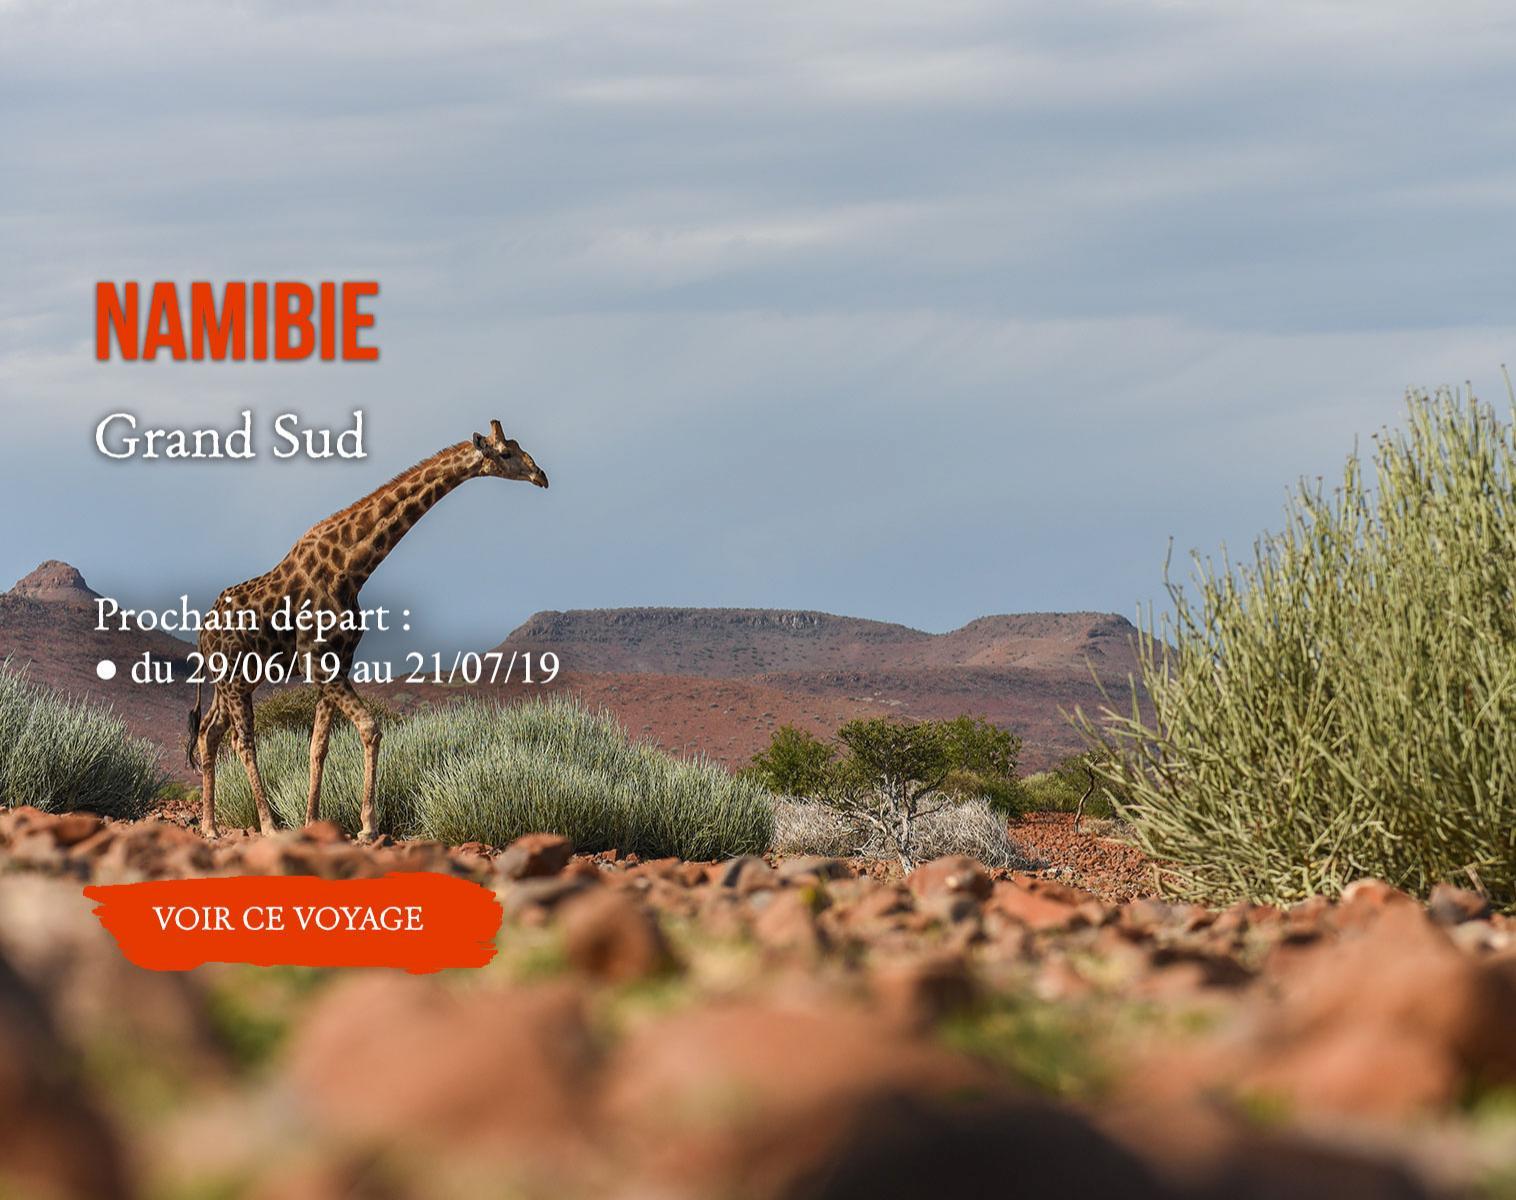 Namibie, Grand Sud